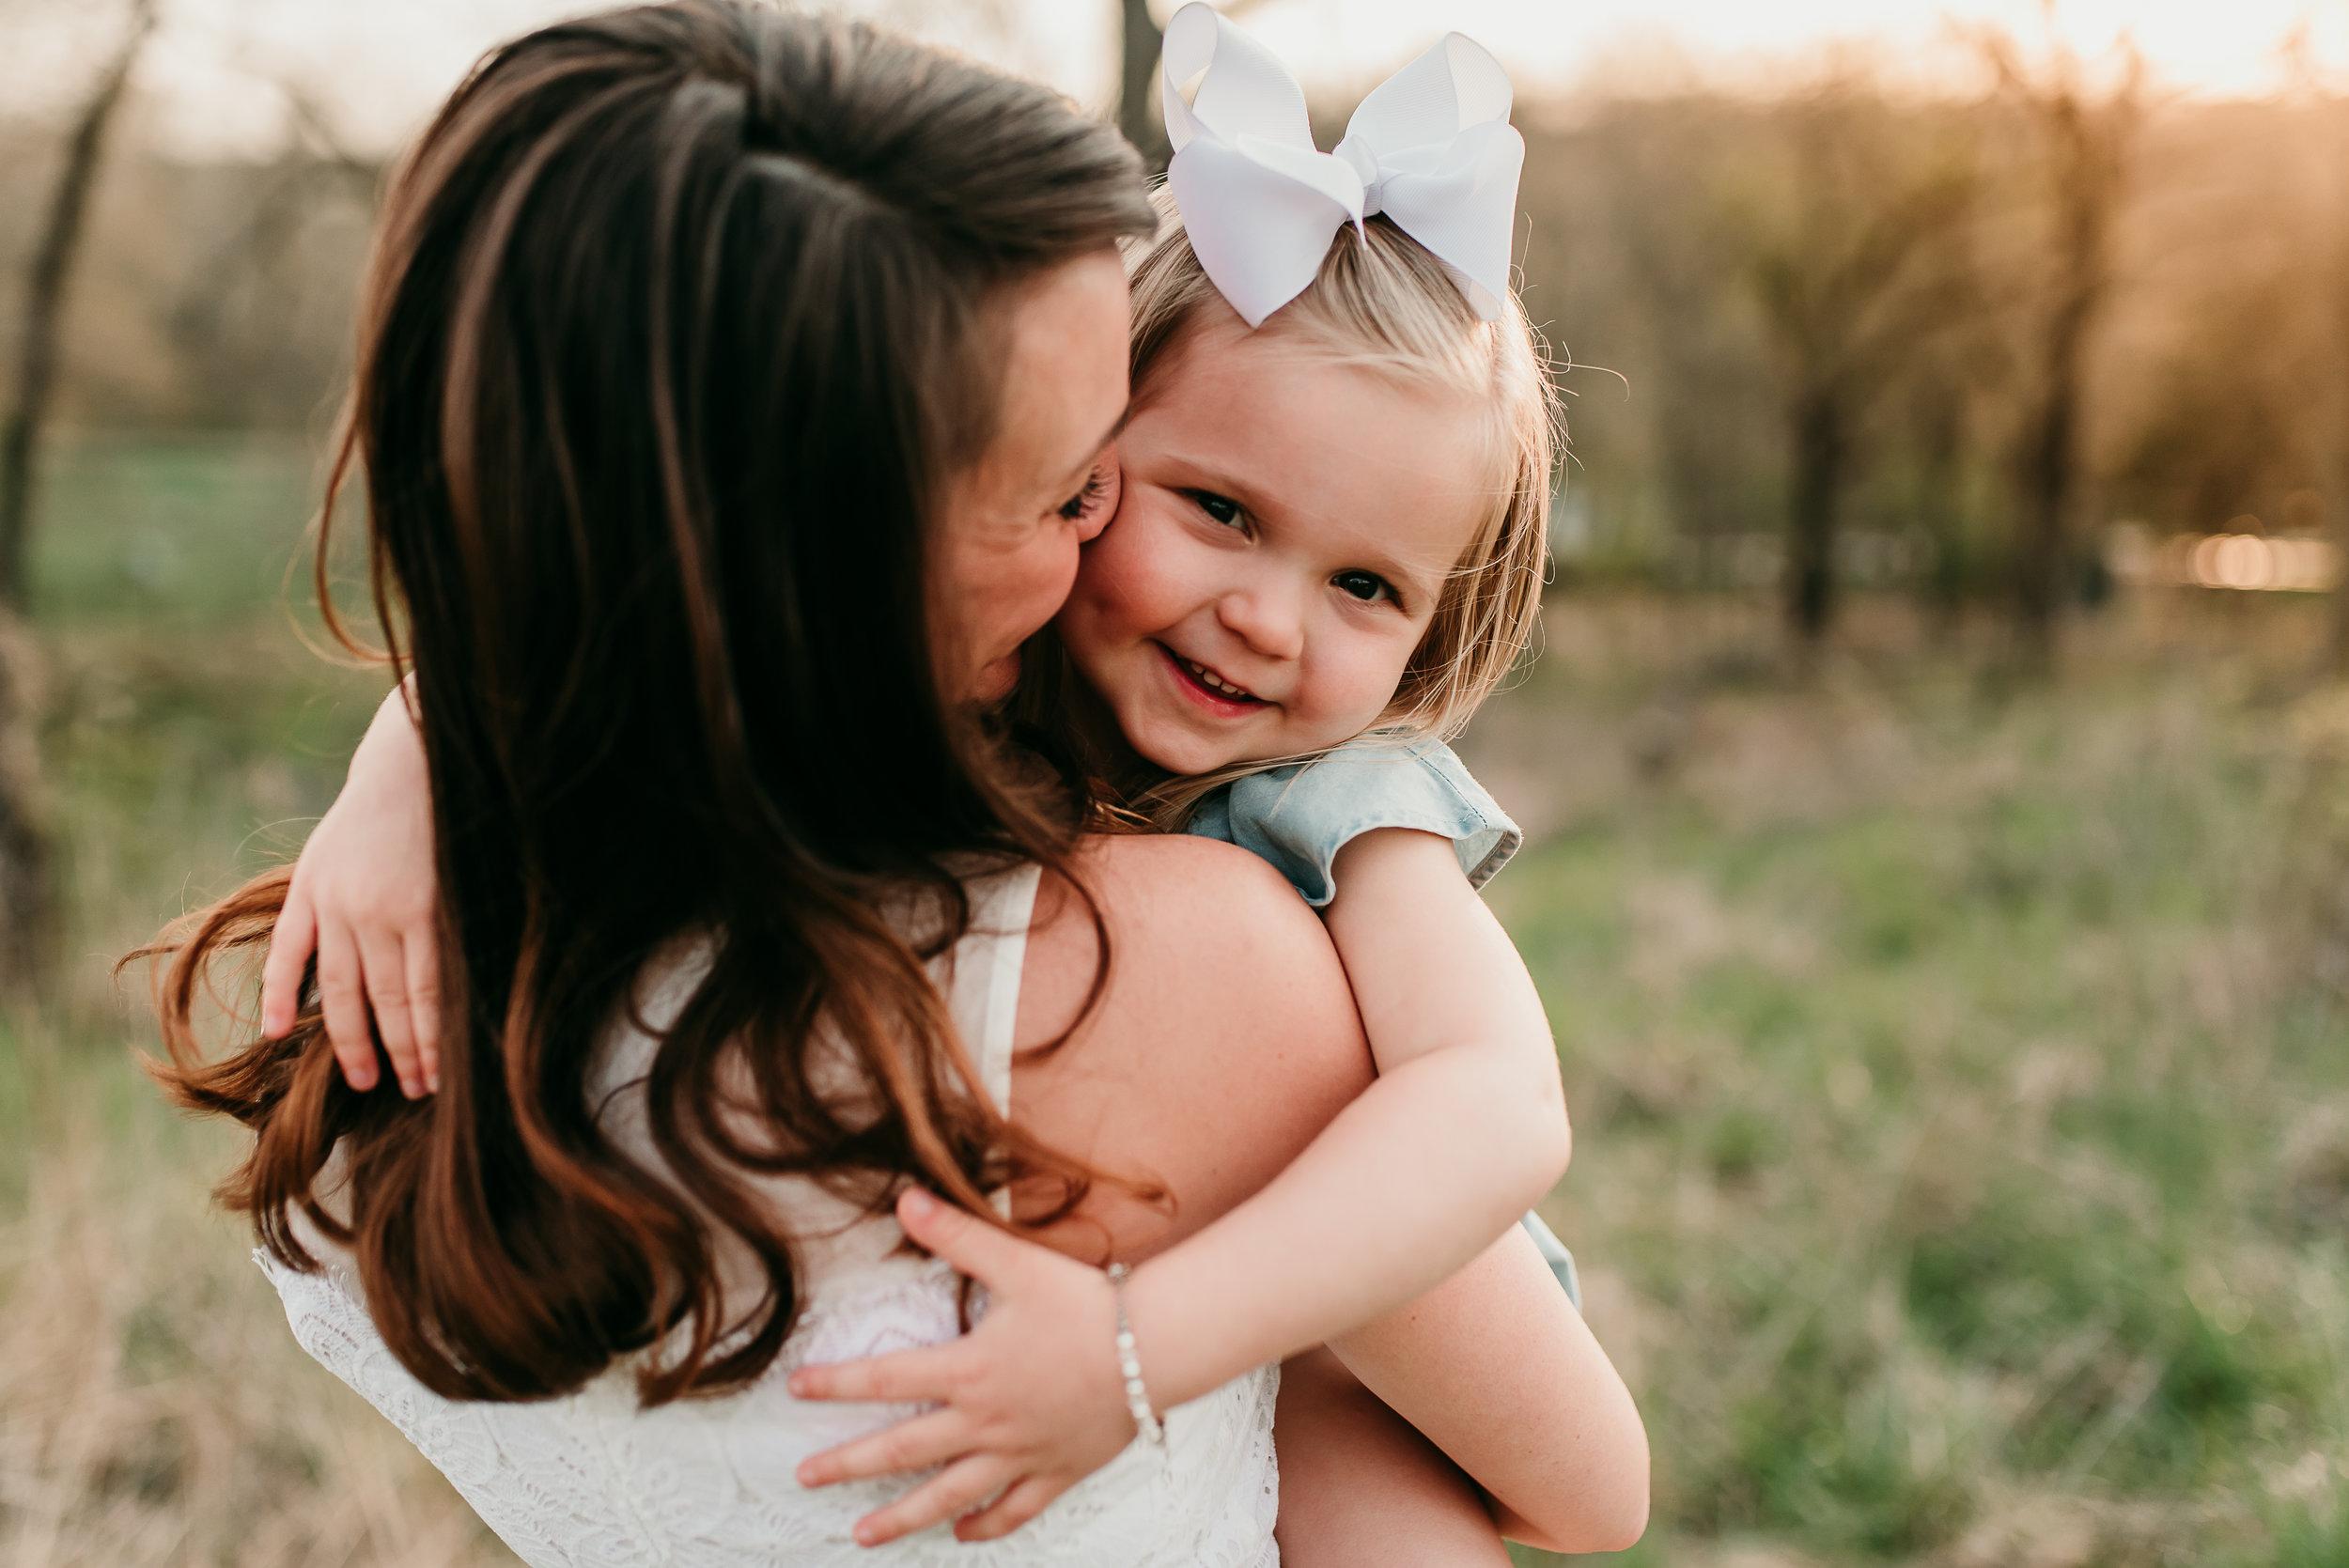 daughter loving on mommy